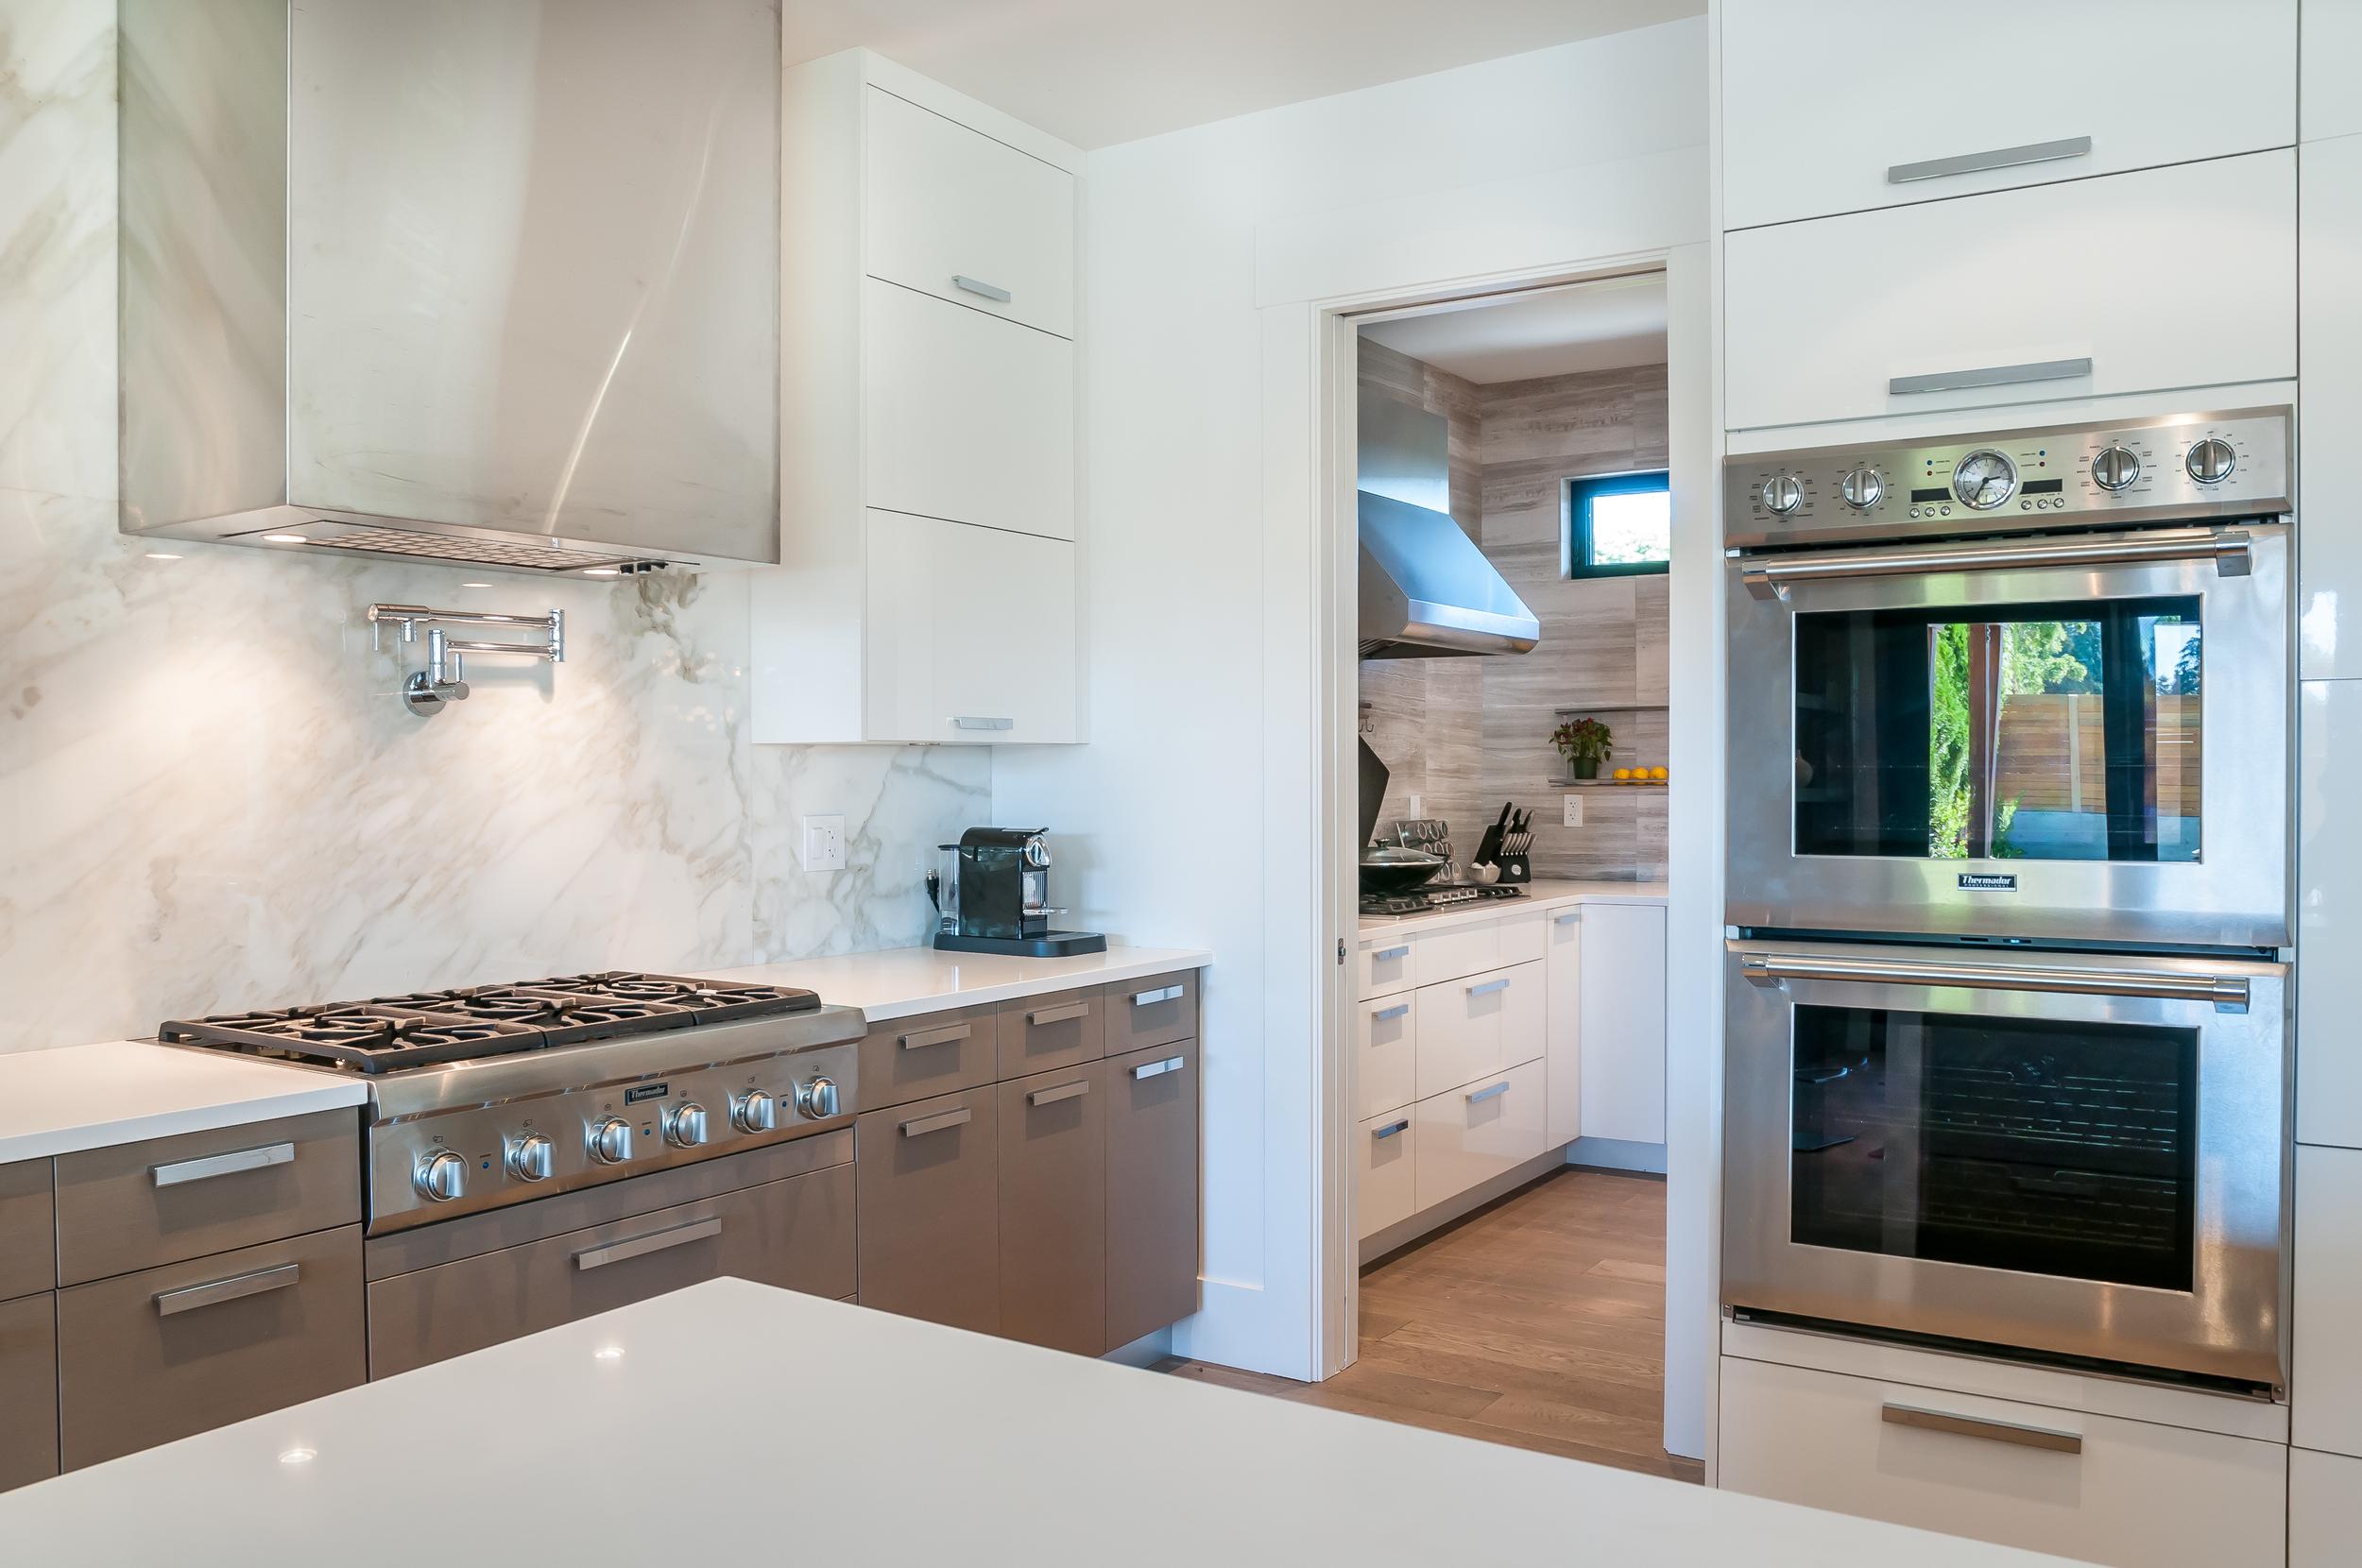 6 - Blaine_House_12_Main_Kitchen.jpg